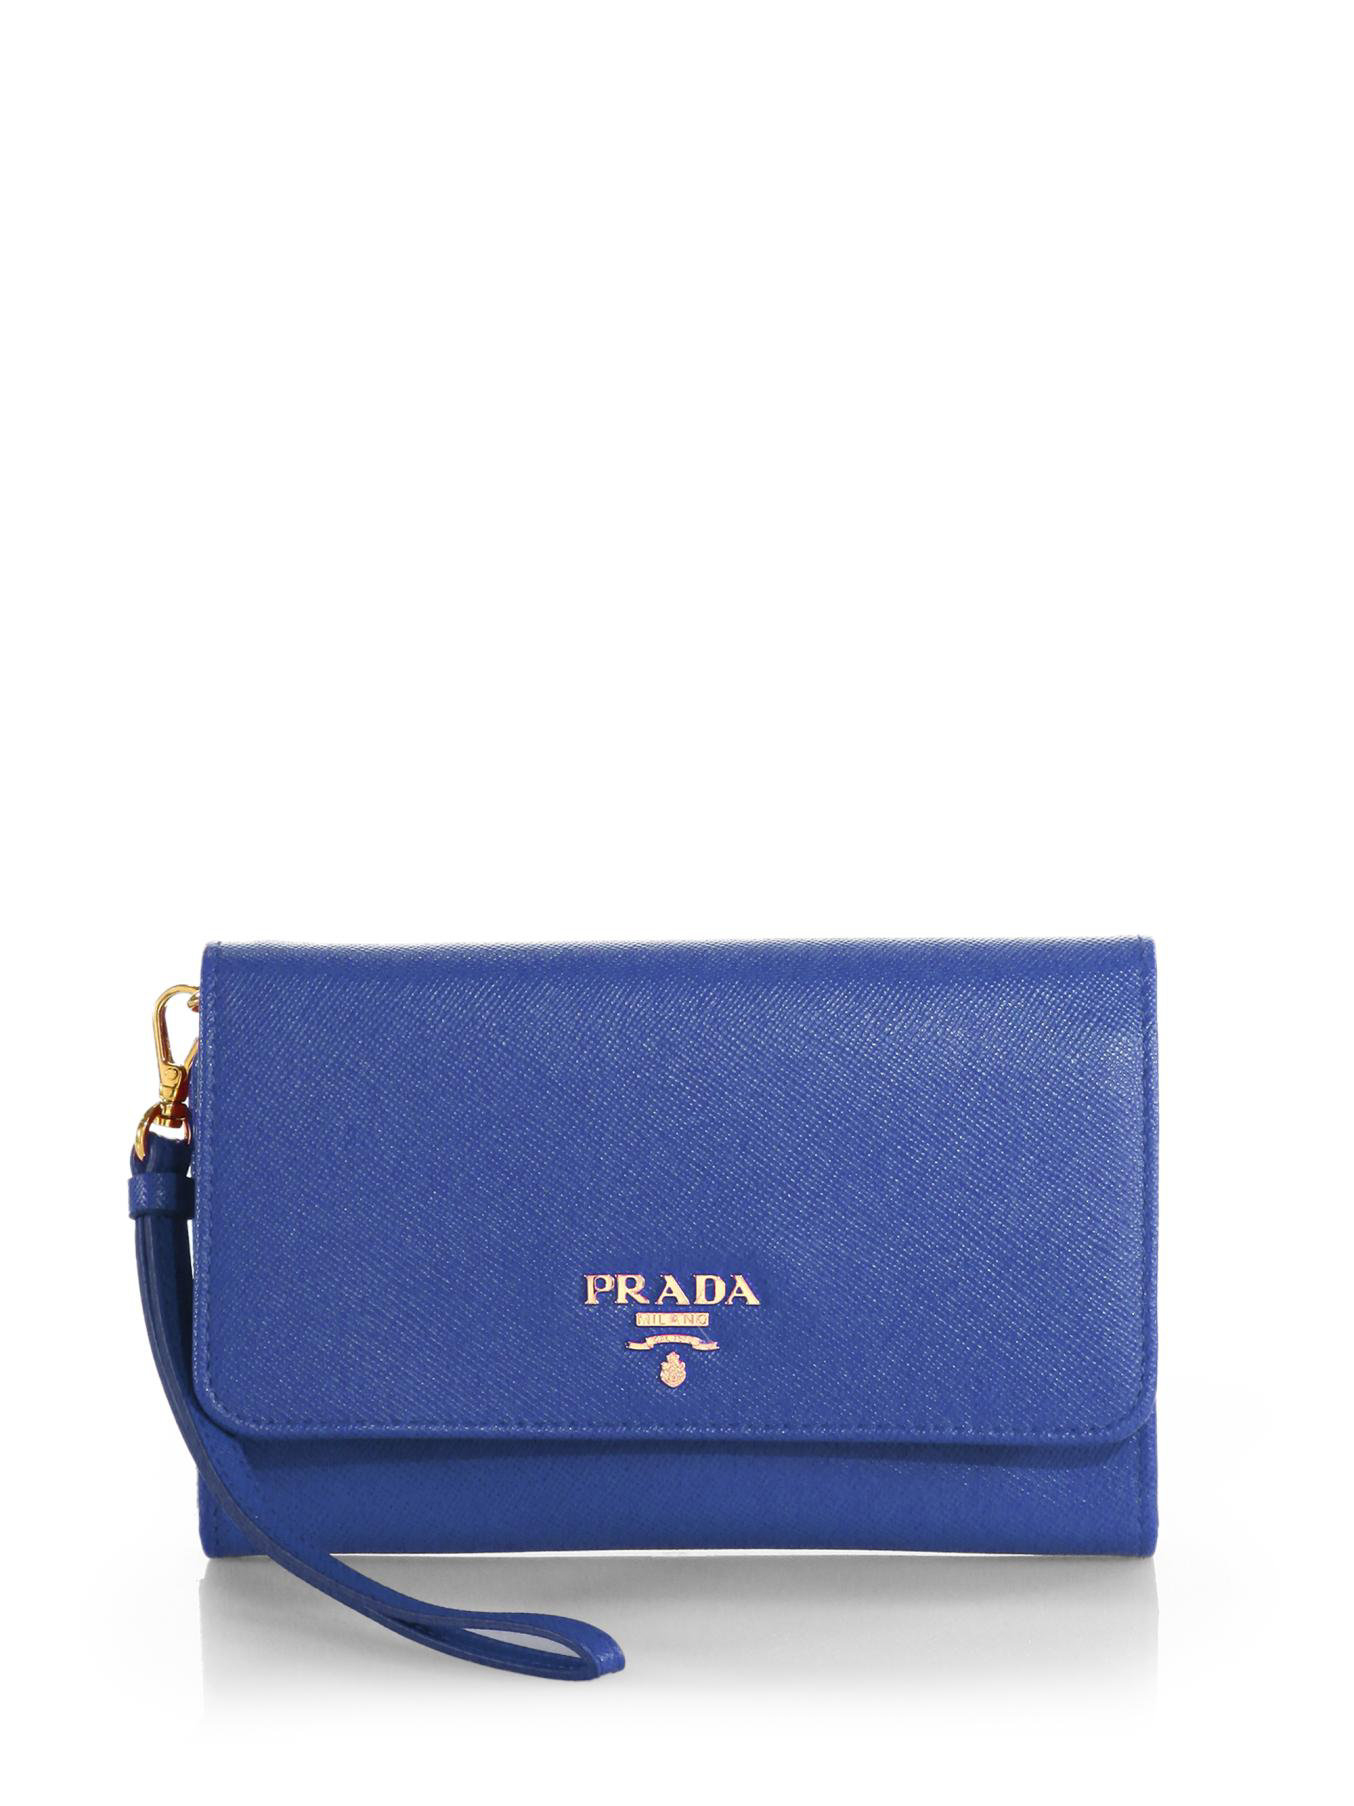 d7e7c099283 ... australia lyst prada saffiano phone wallet with strap in blue c1156  c5f9c